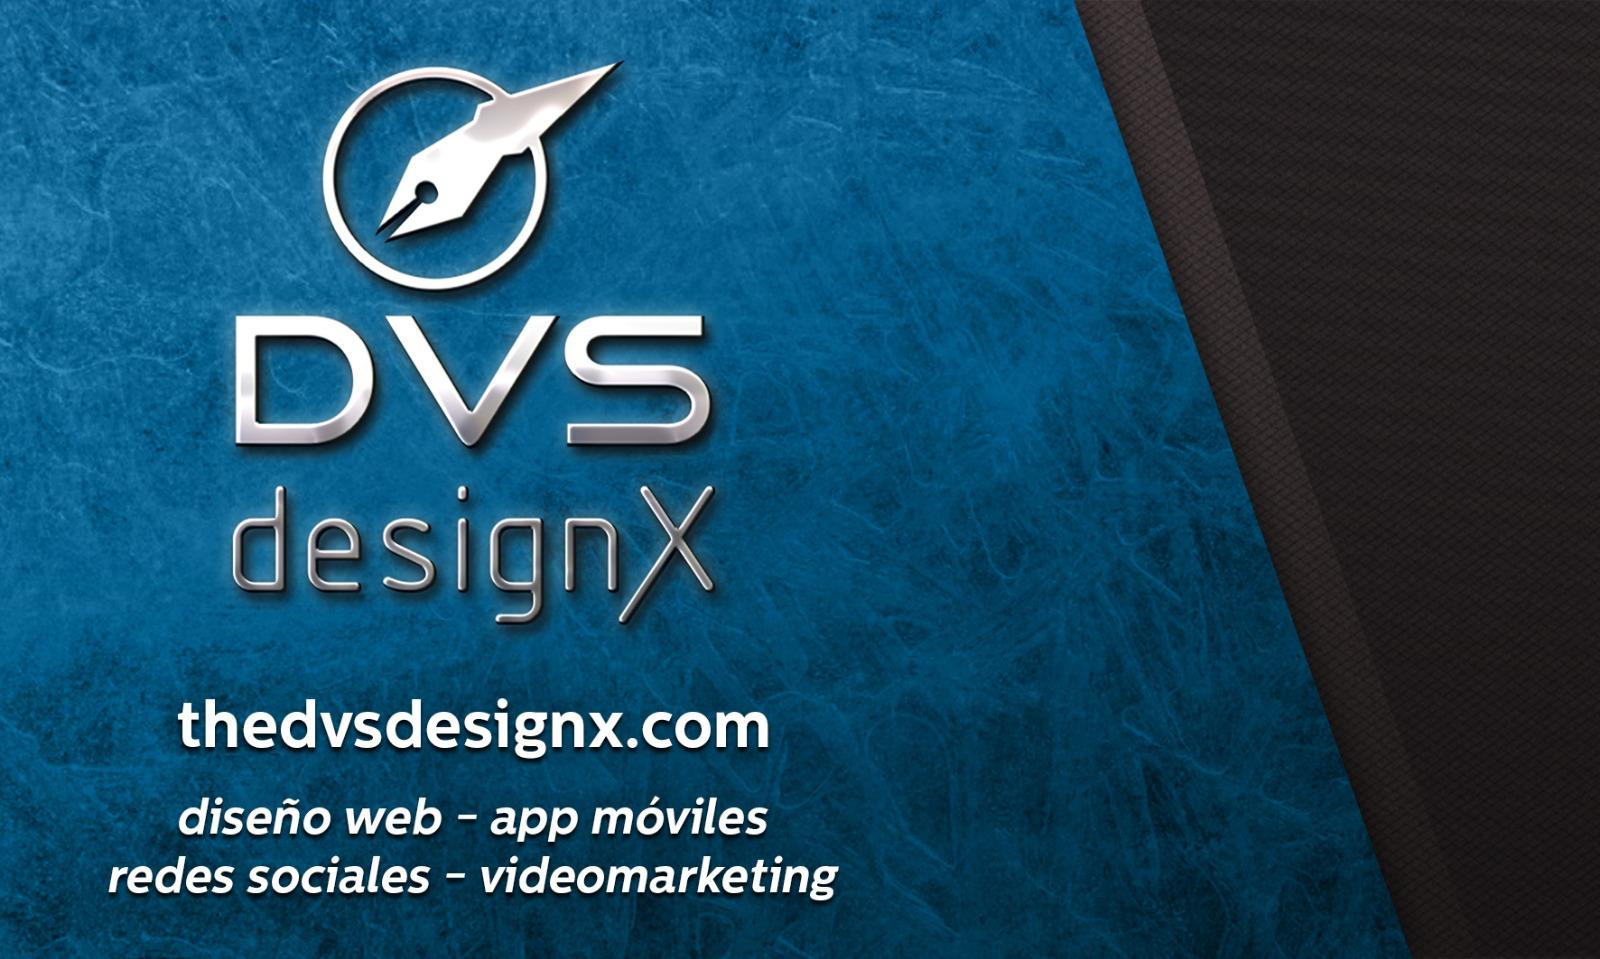 DVS Designx